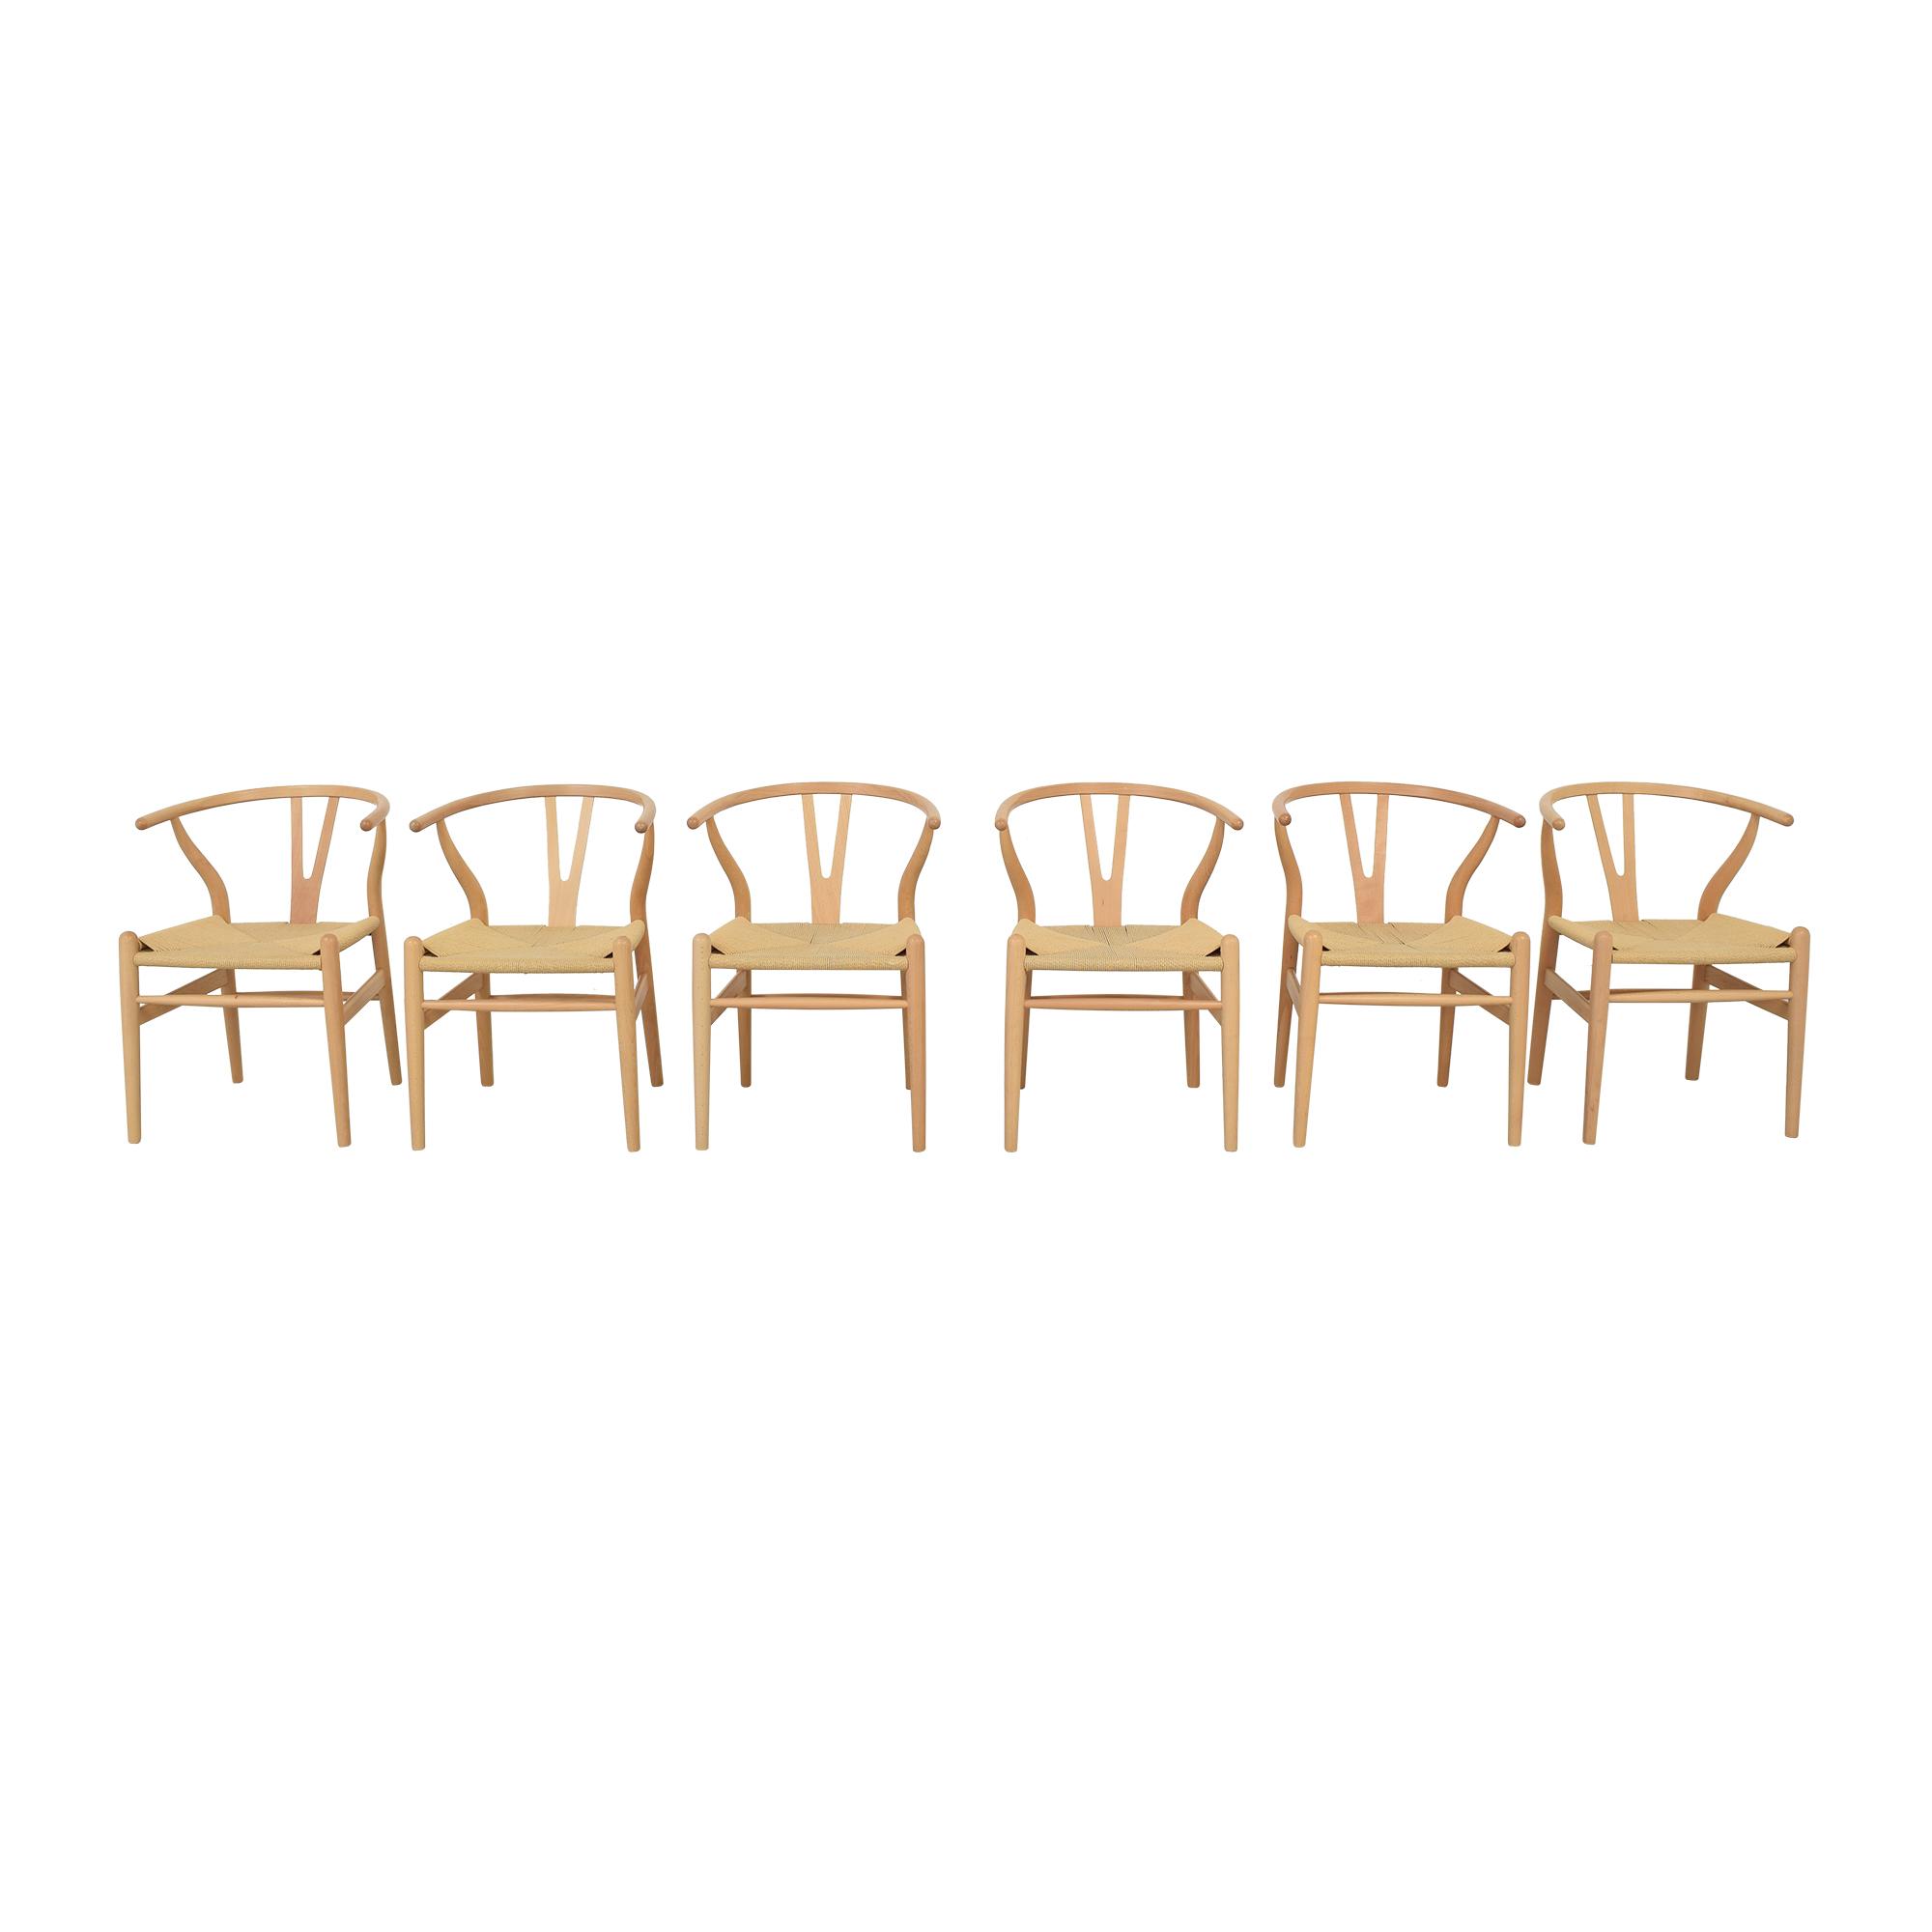 Baxton Studio Baxton Studio Wishbone Modern Brown Wood Dining Chairs nj